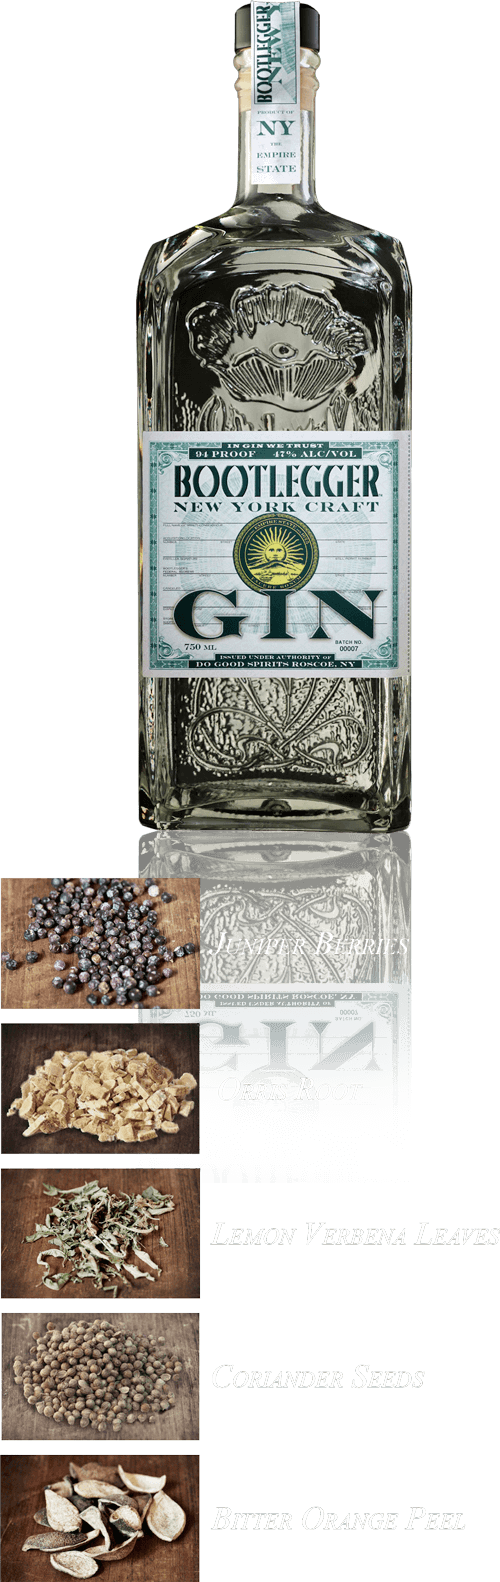 Bootlegger New York Craft Gin